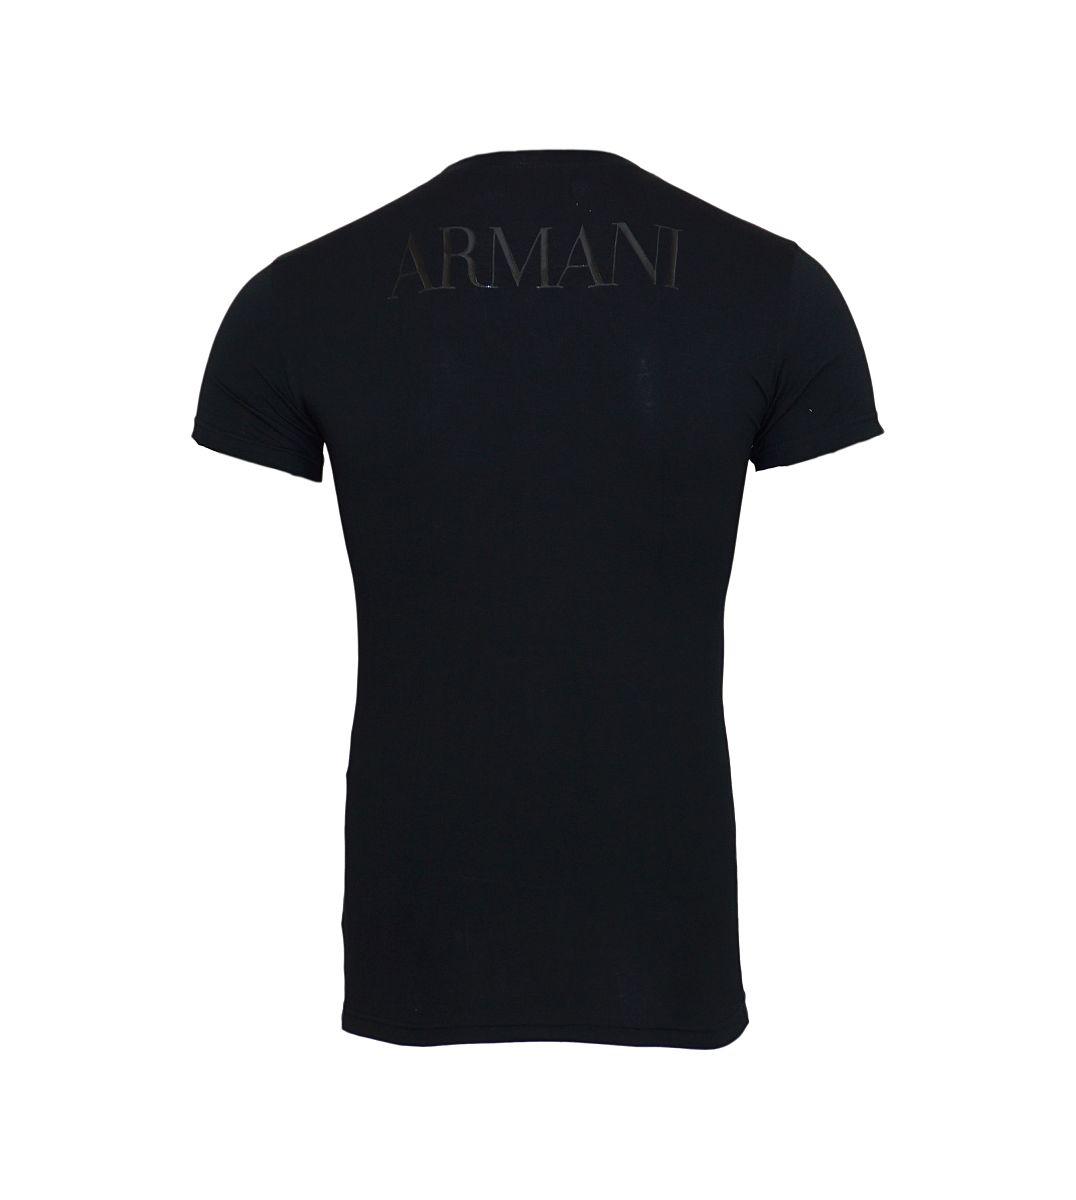 Emporio Armani T-Shirt Shirt Rundhals 111035 7A516 00020 NERO HW17-EATS1